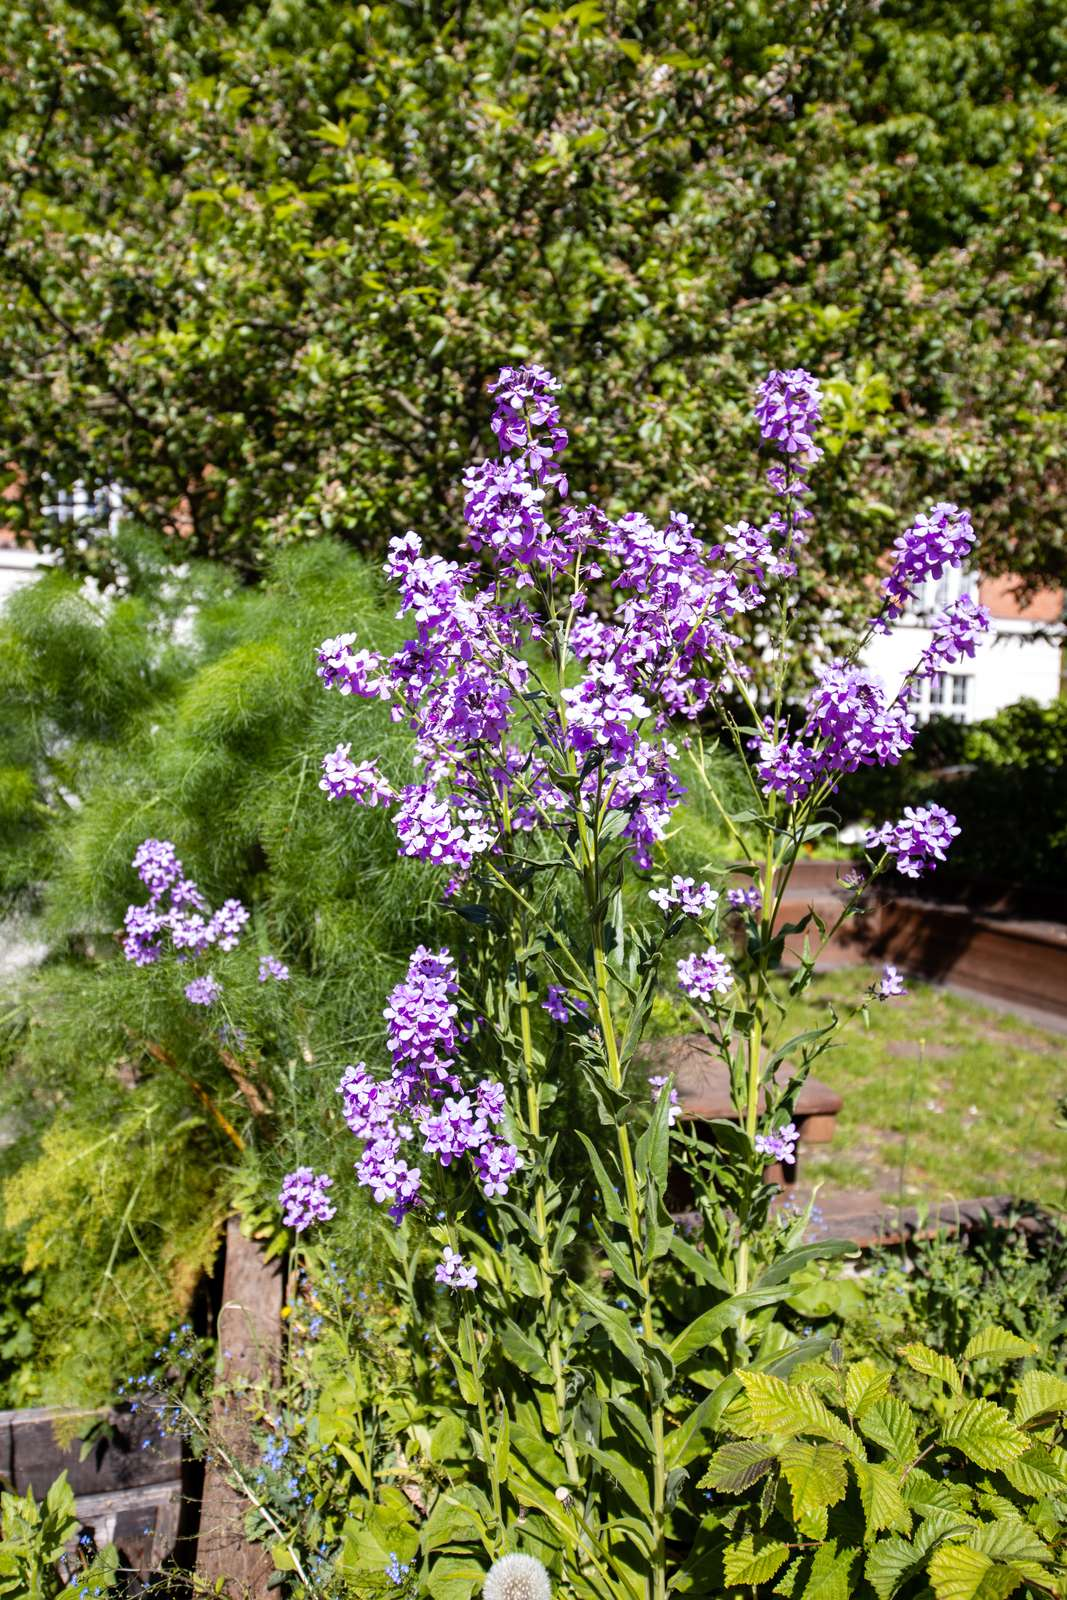 Lilla blomster ved Nyelandsvej 27-29